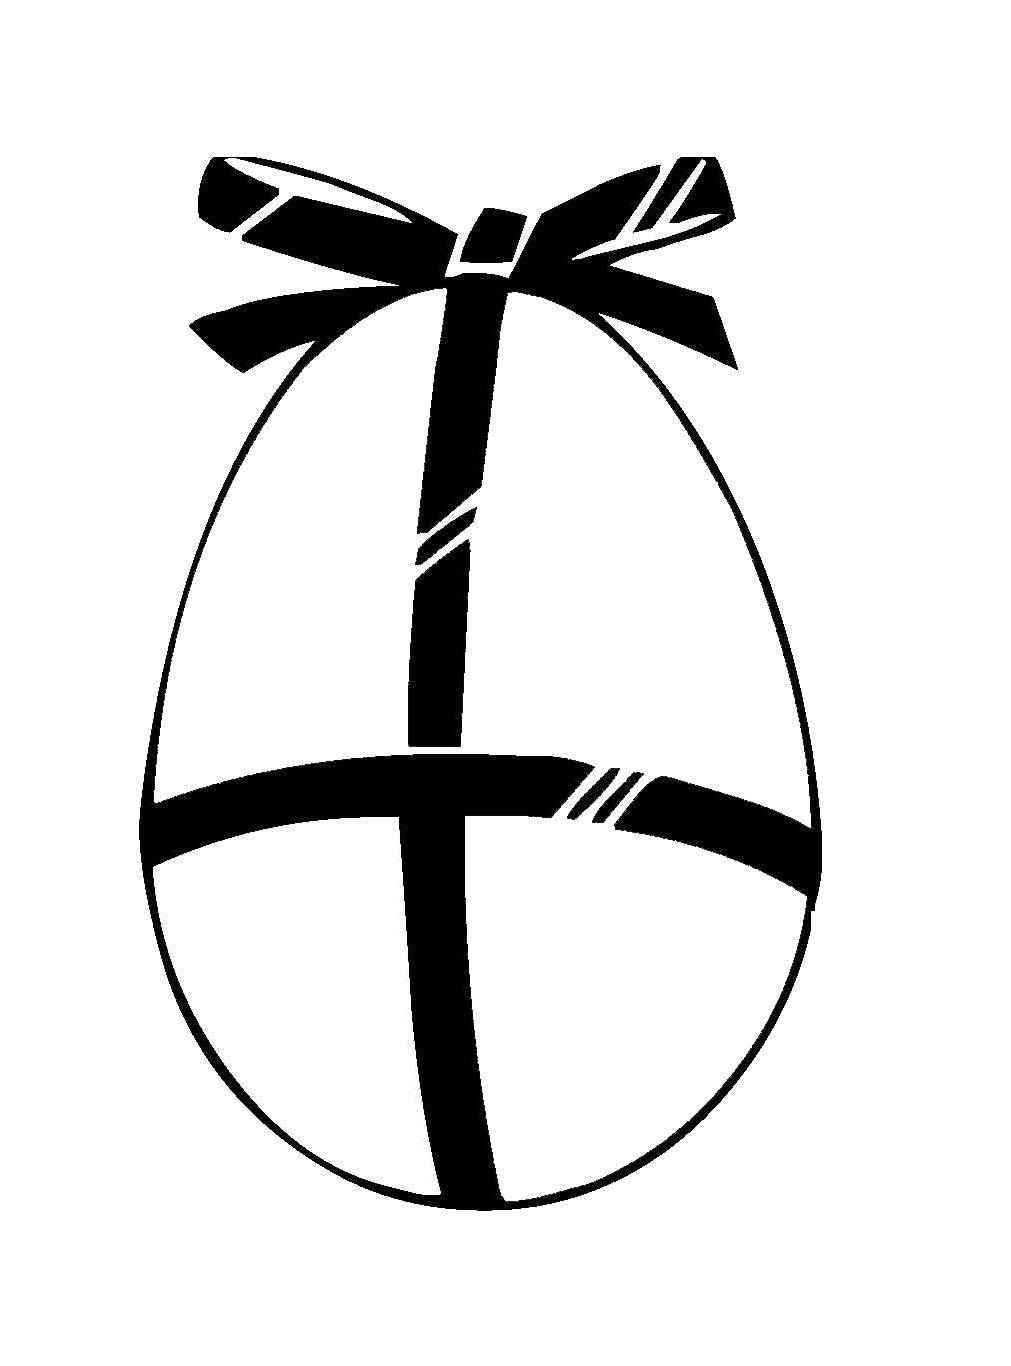 Ausmalbild Ostern: Osterei mit Schleife kostenlos ausdrucken